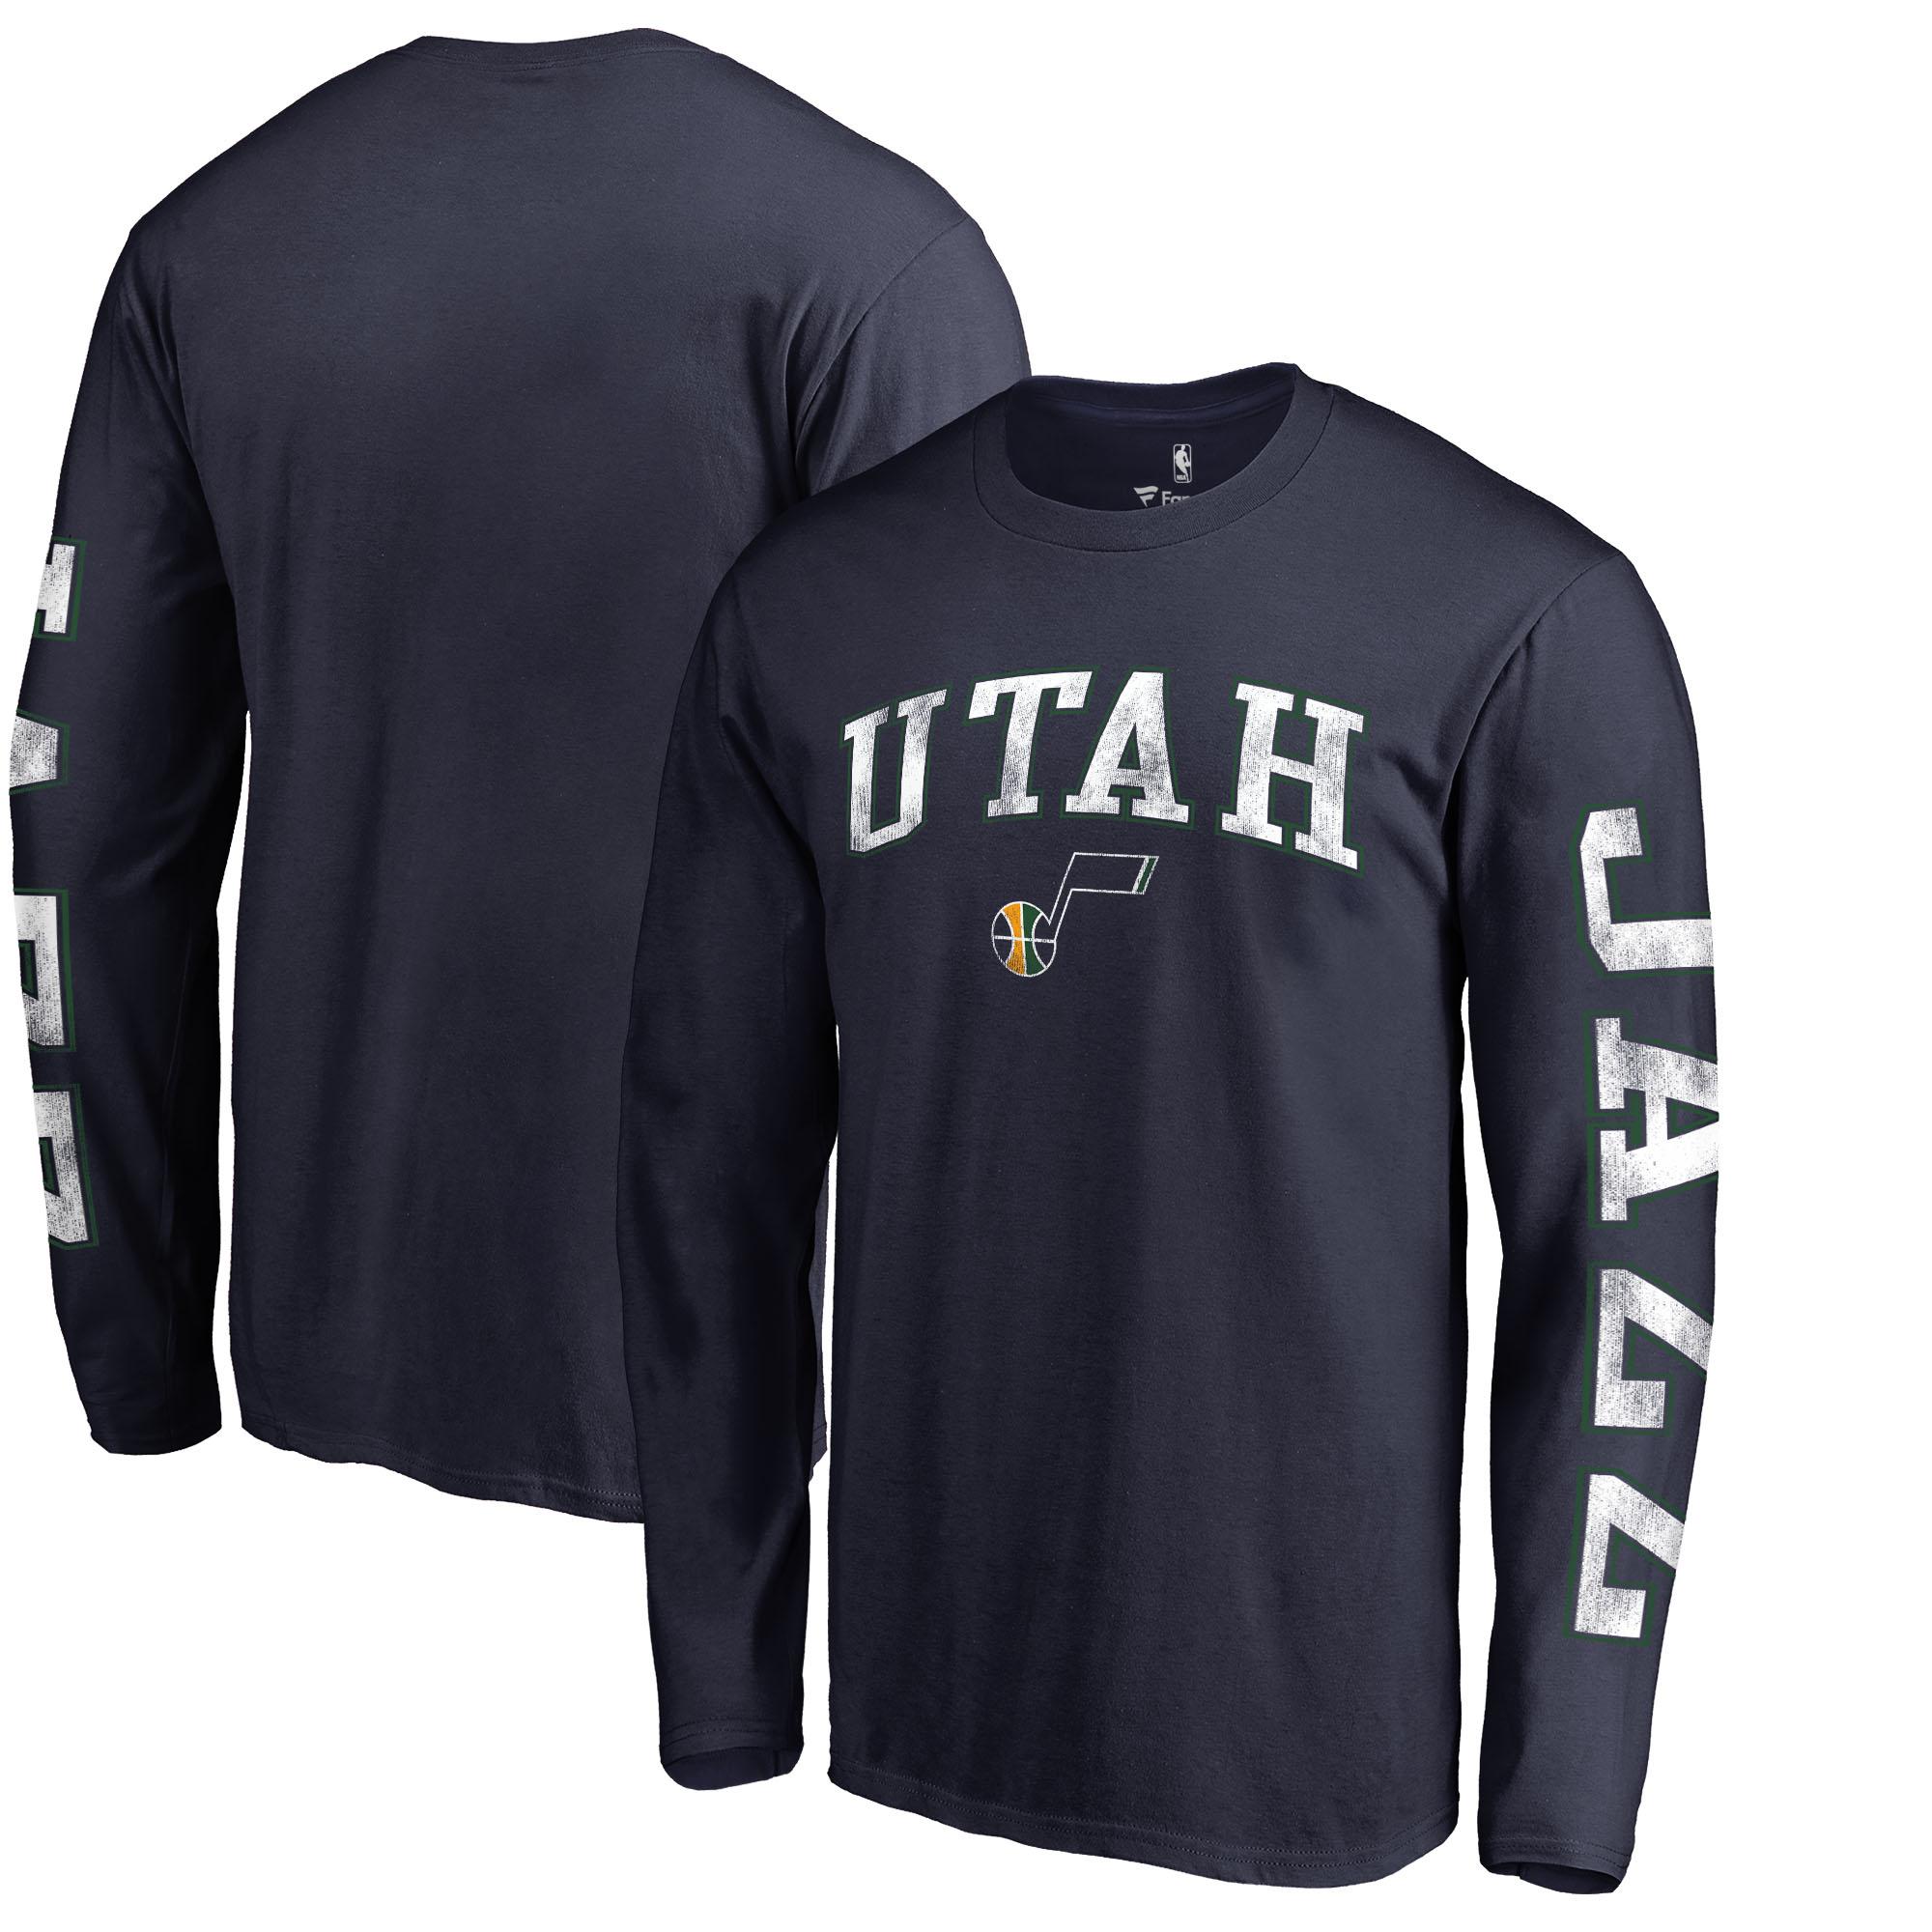 Utah Jazz Fanatics Branded Distressed Arch Primary Logo Long Sleeve T-Shirt - Navy